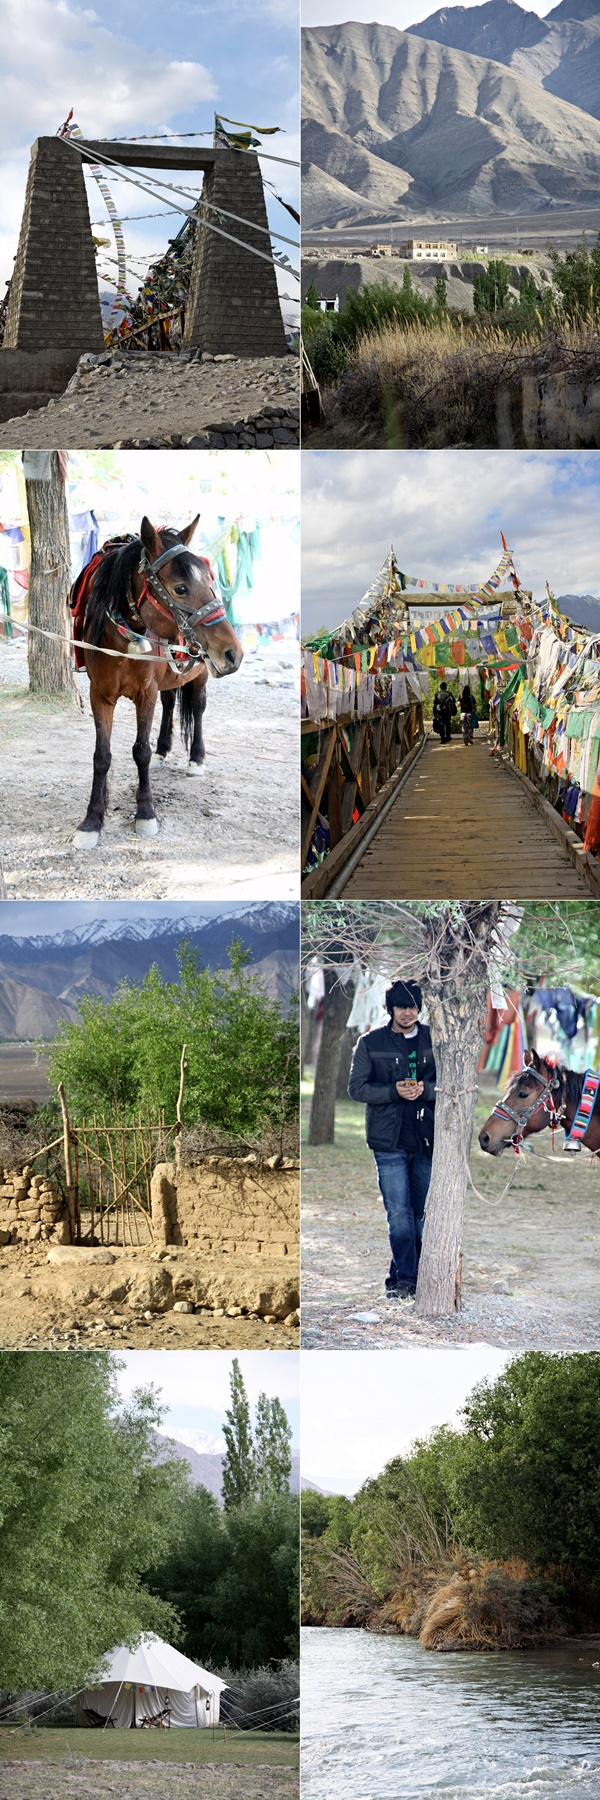 Leh, Kashmir 2015